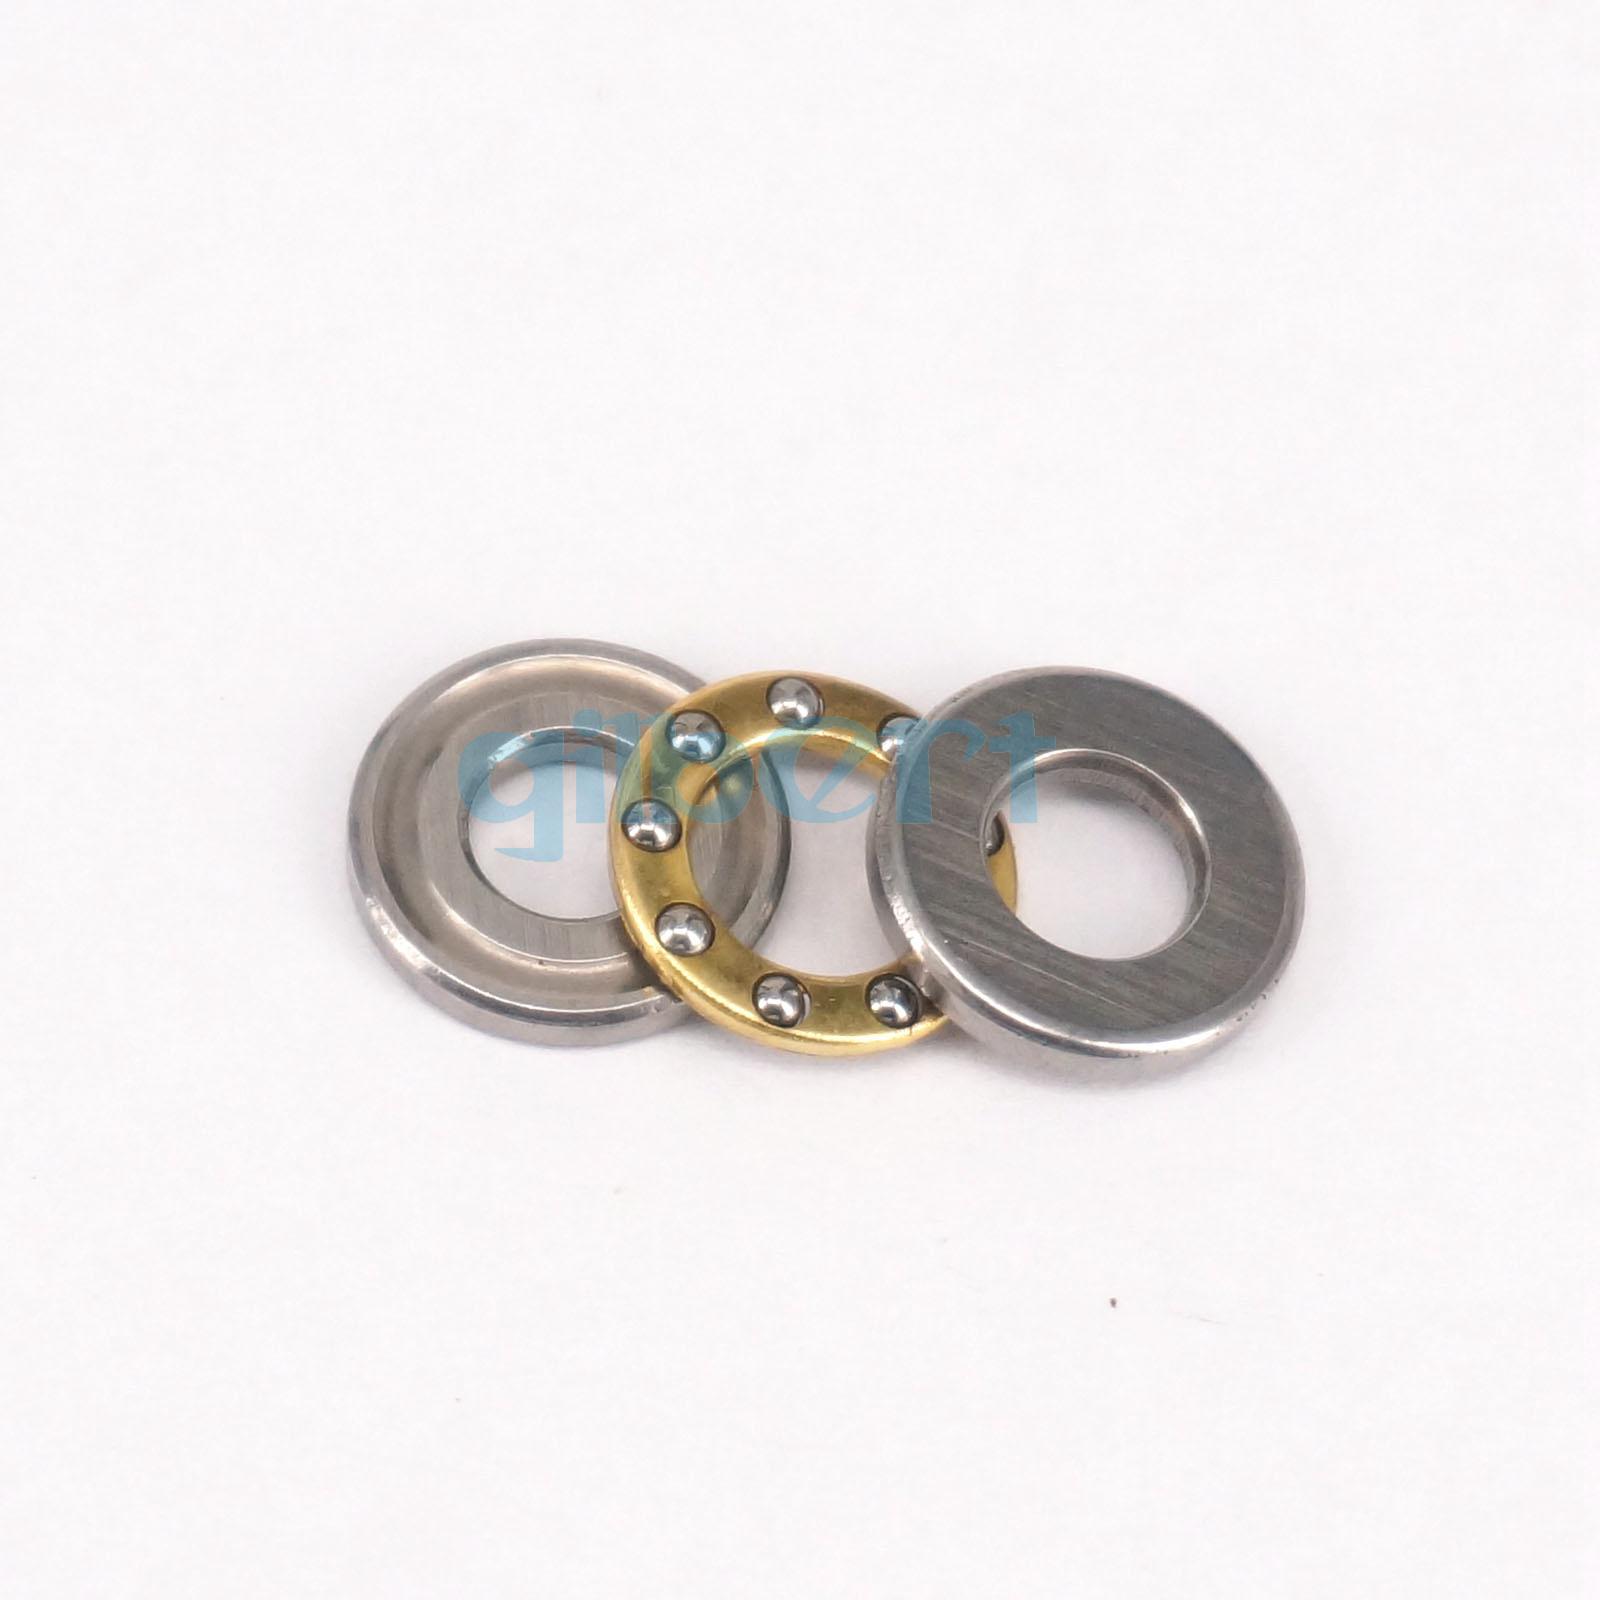 10PCS 5x11x4.5mm Axial Ball Flat Washers Thrust Bearings 3-Parts ABEC-1